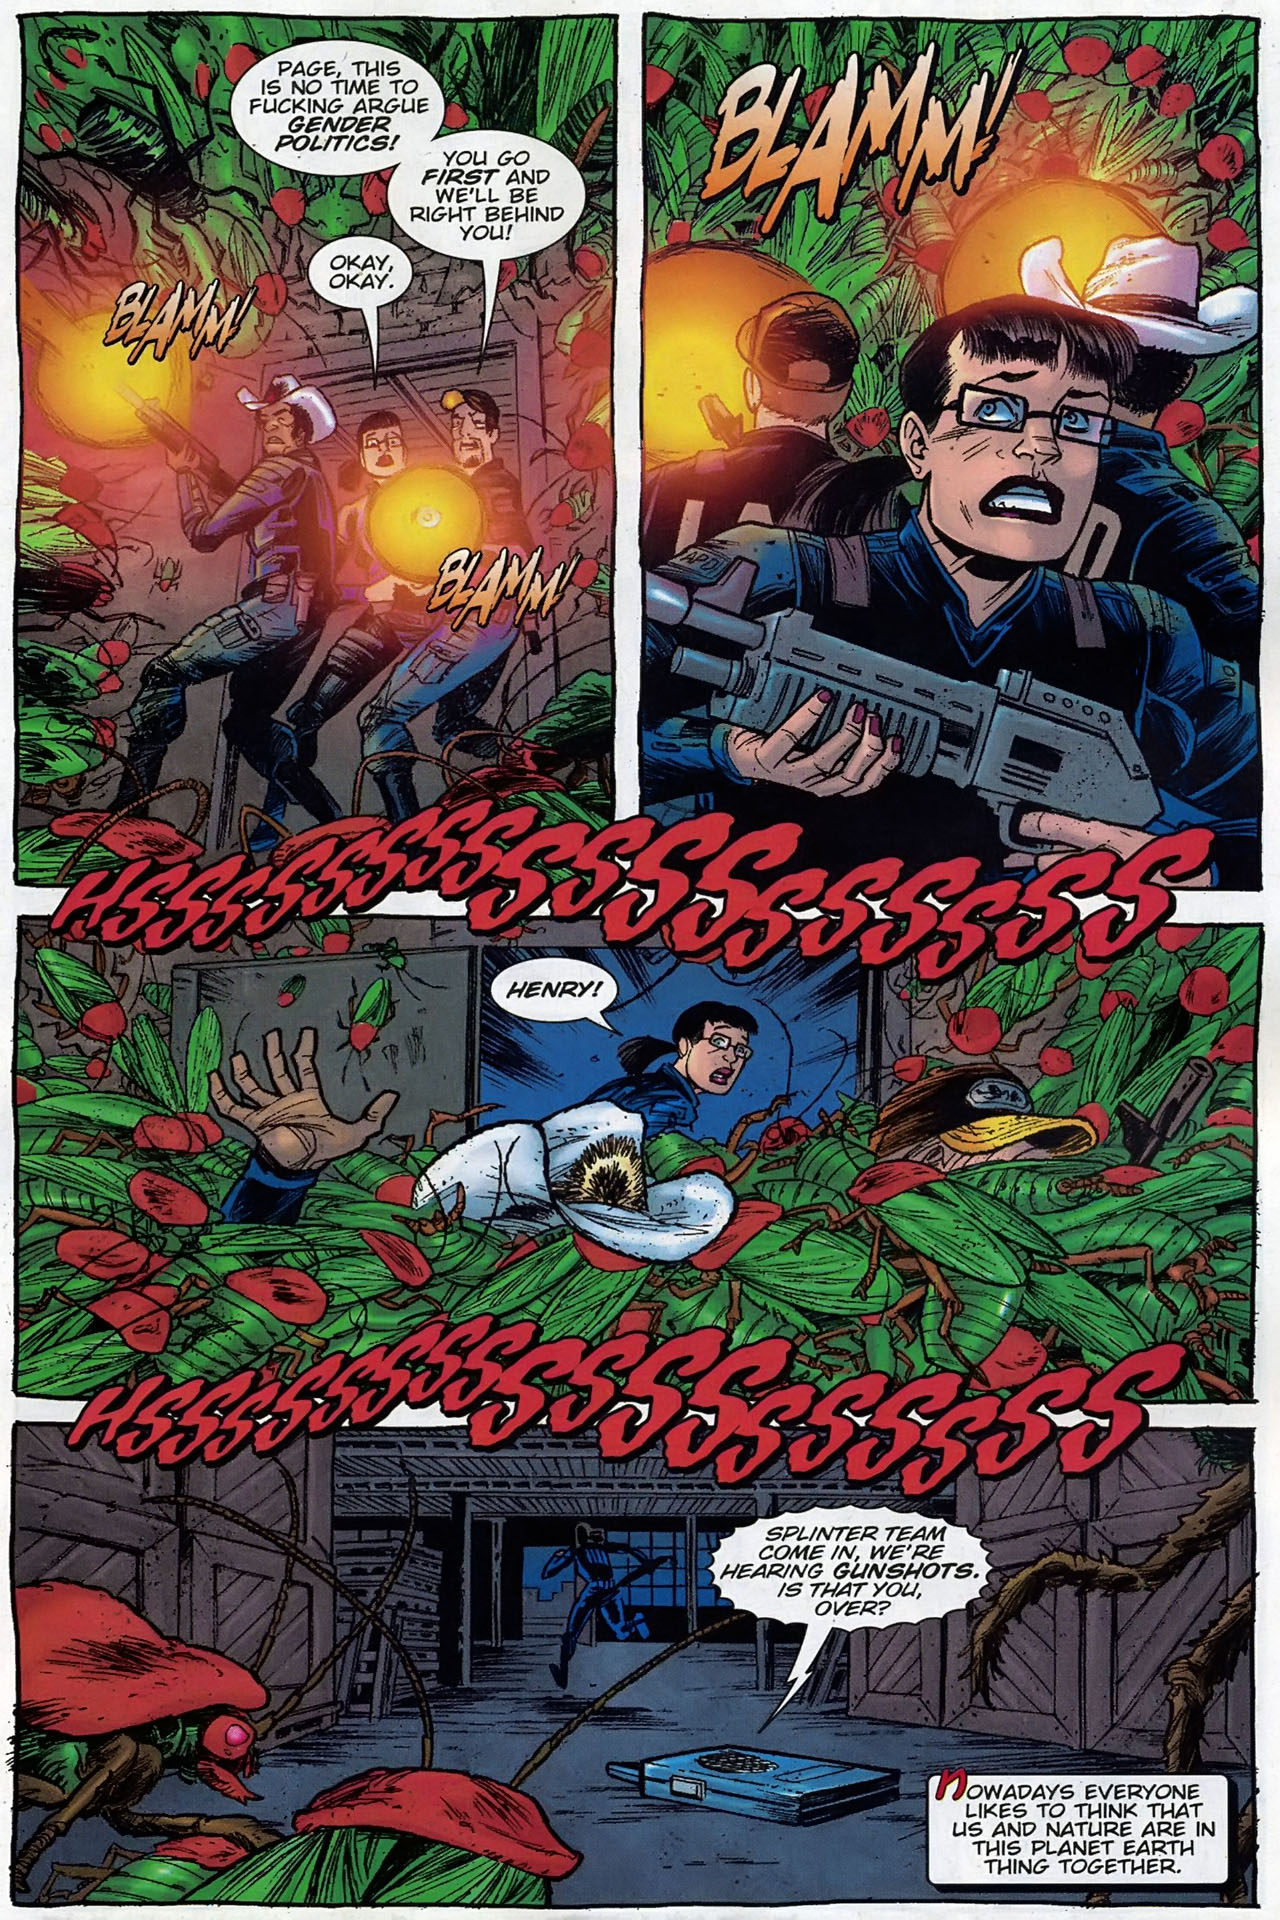 Read online The Exterminators comic -  Issue #30 - 2